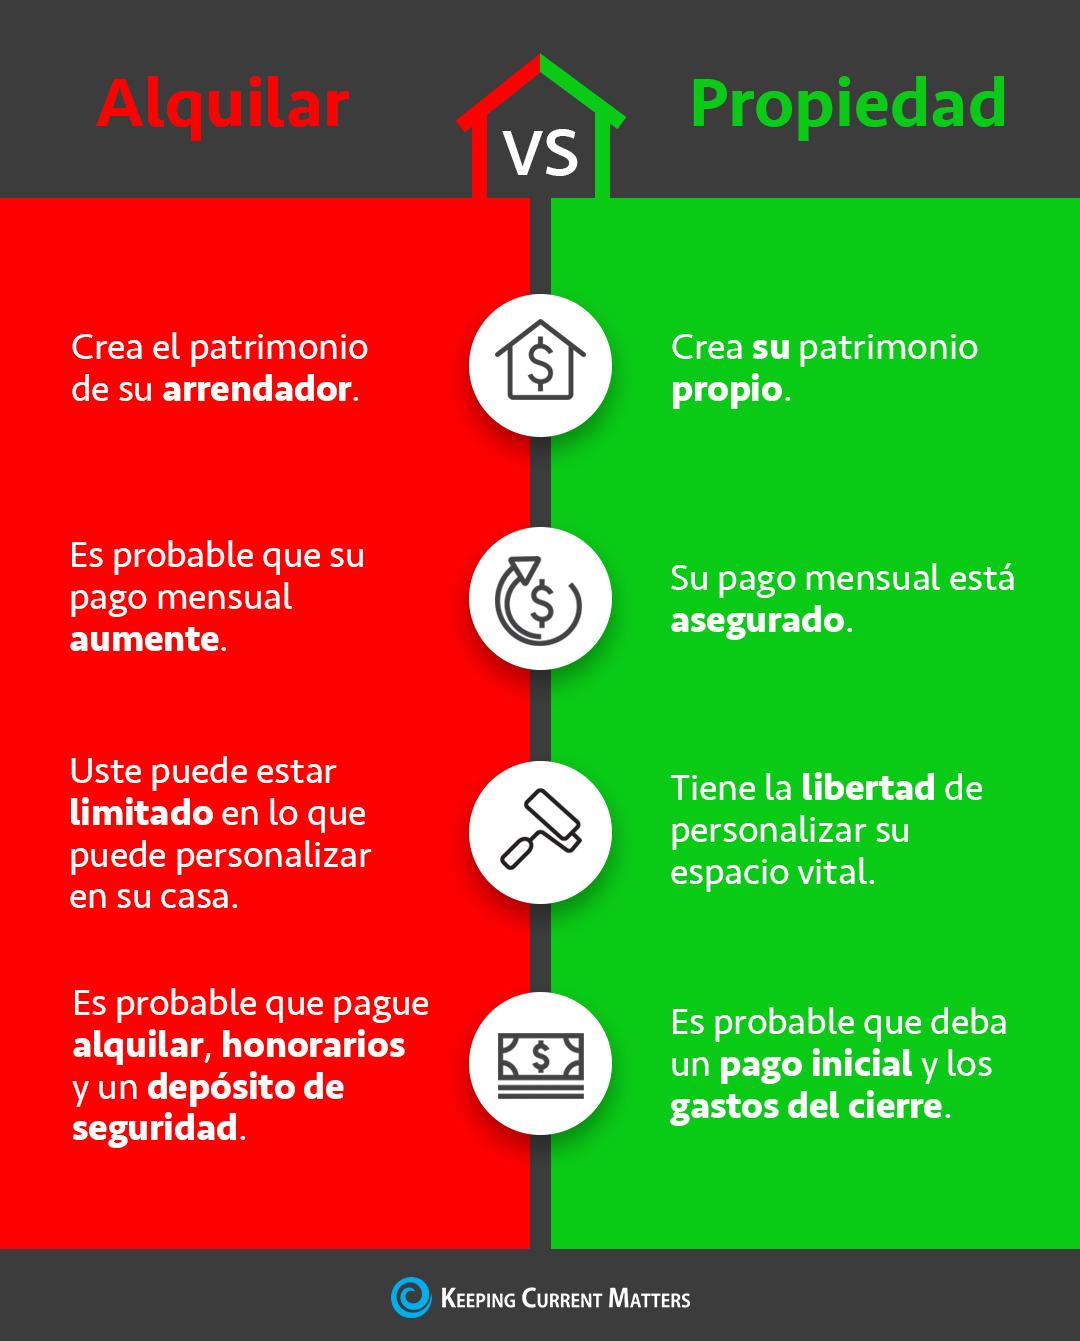 Alquilar Vs Propiedad [infografía] | Keeping Current Matters